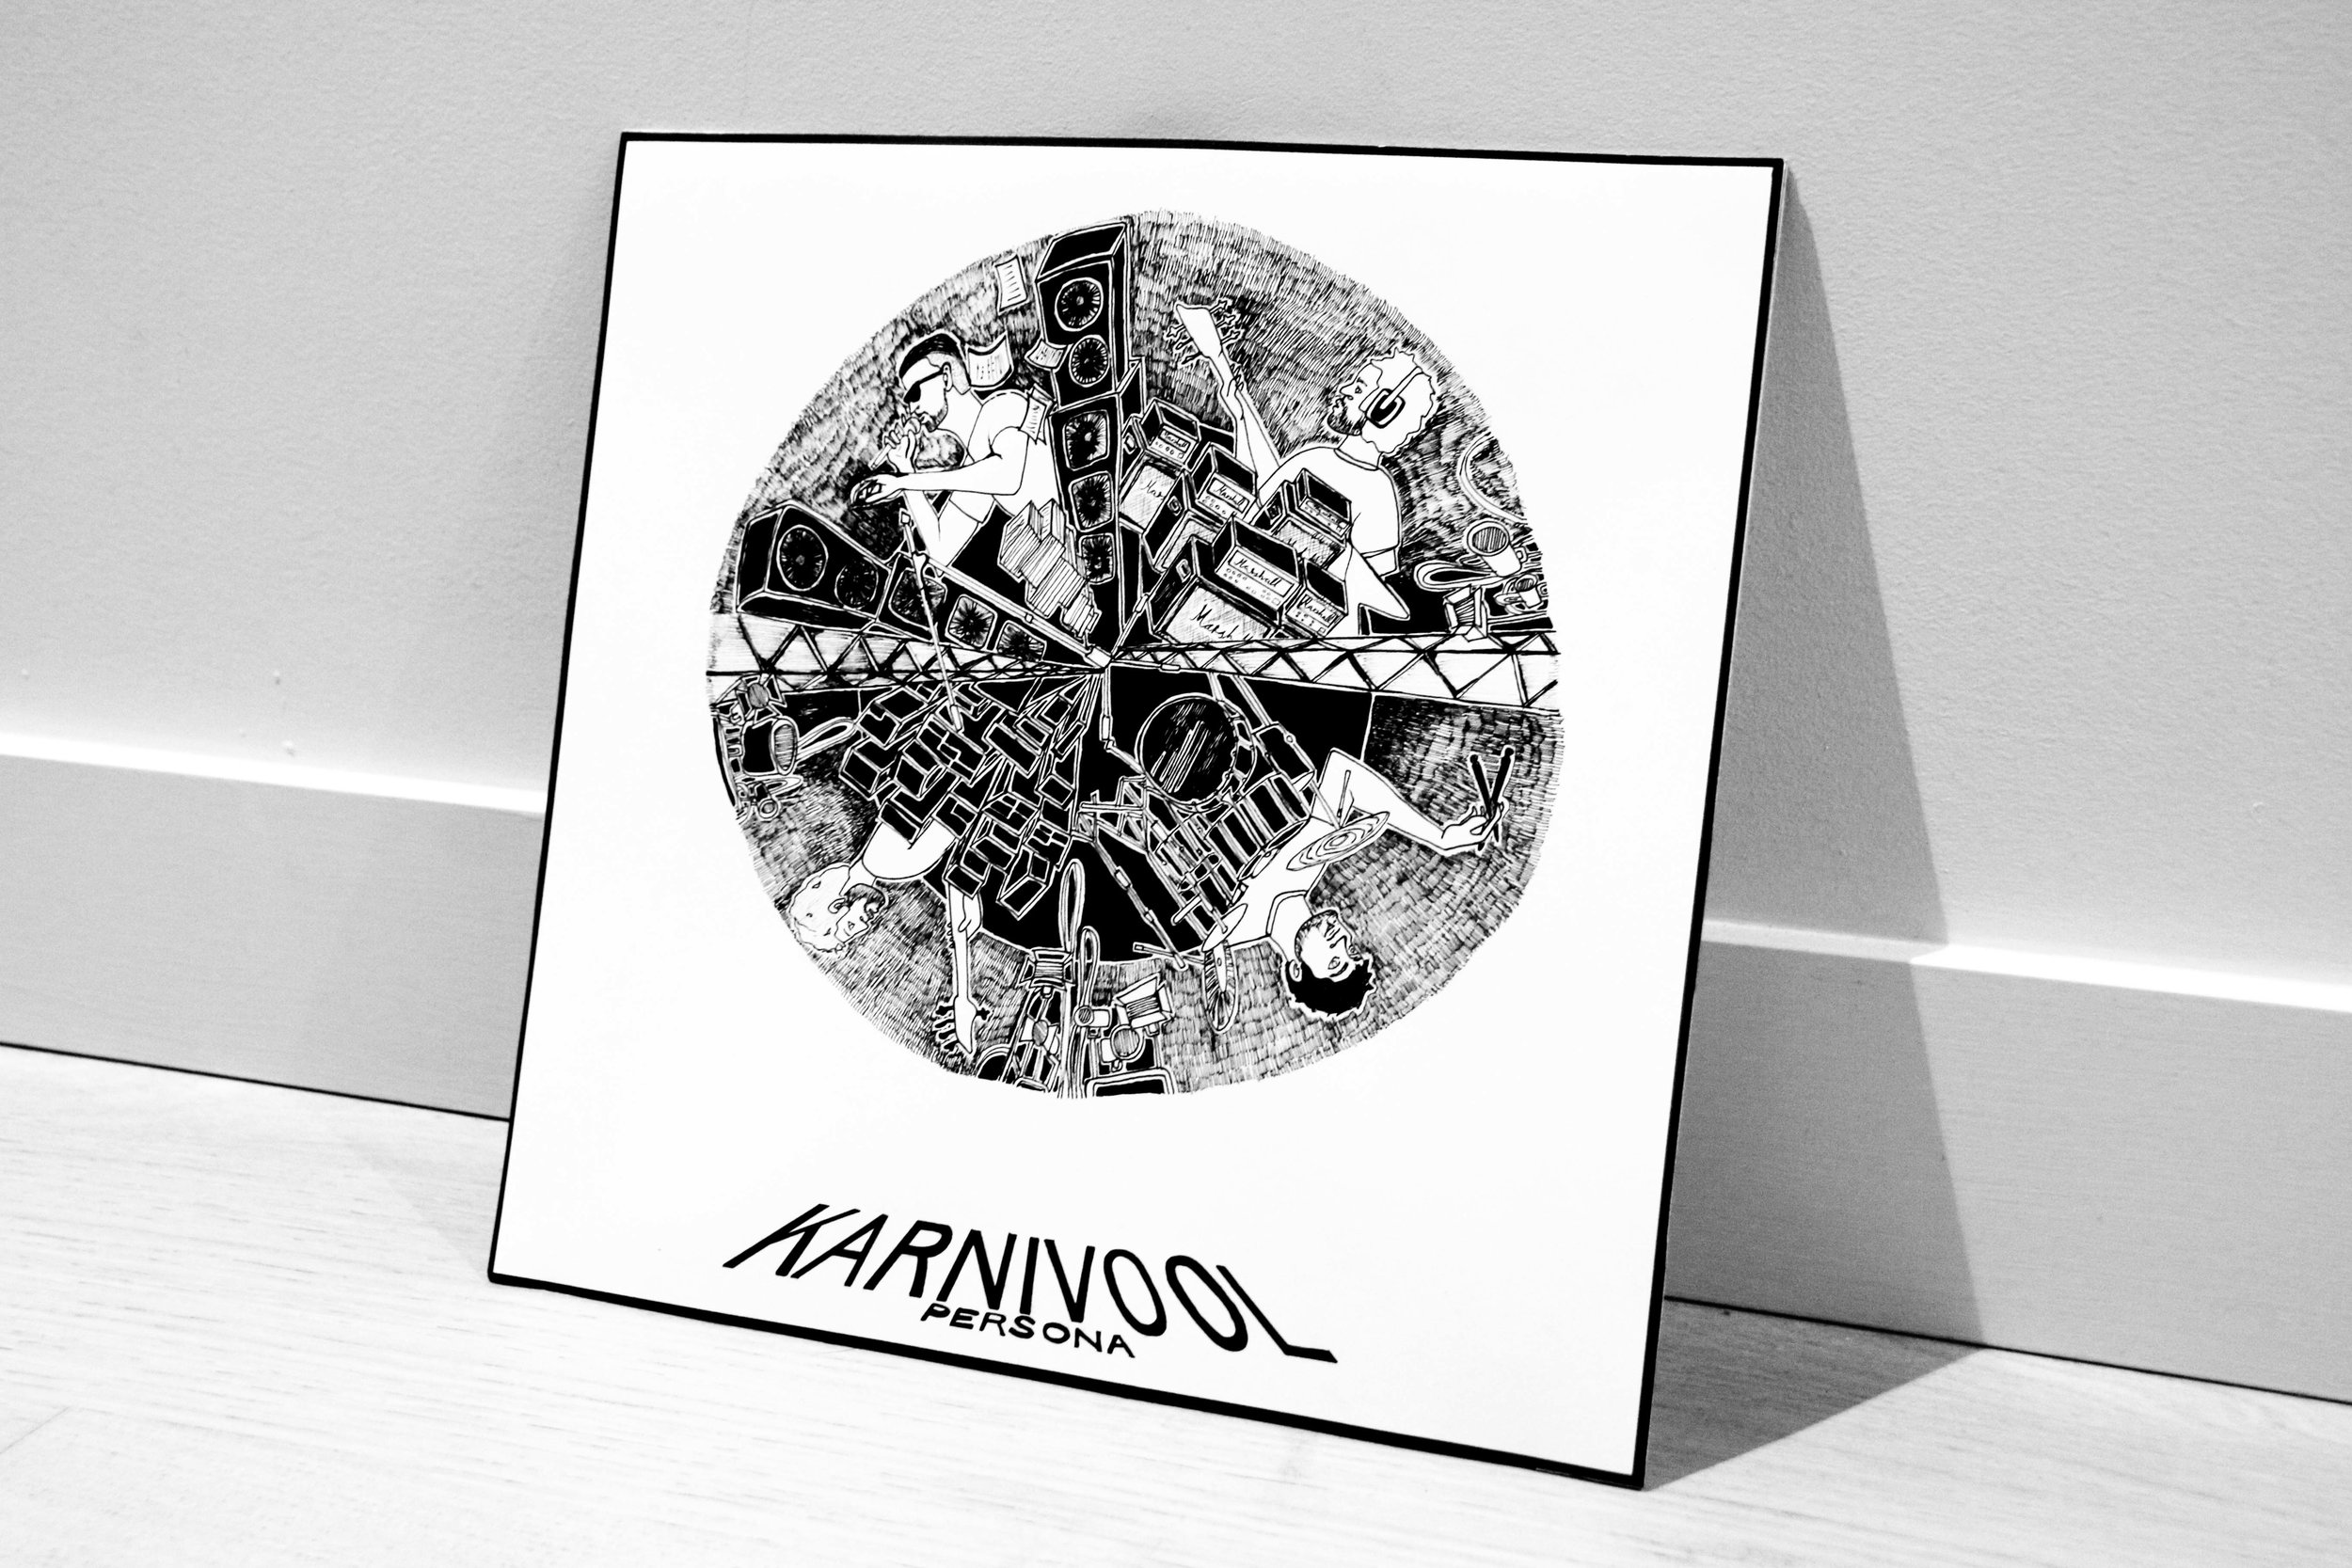 Karnivool Vinyl Sleeve Design